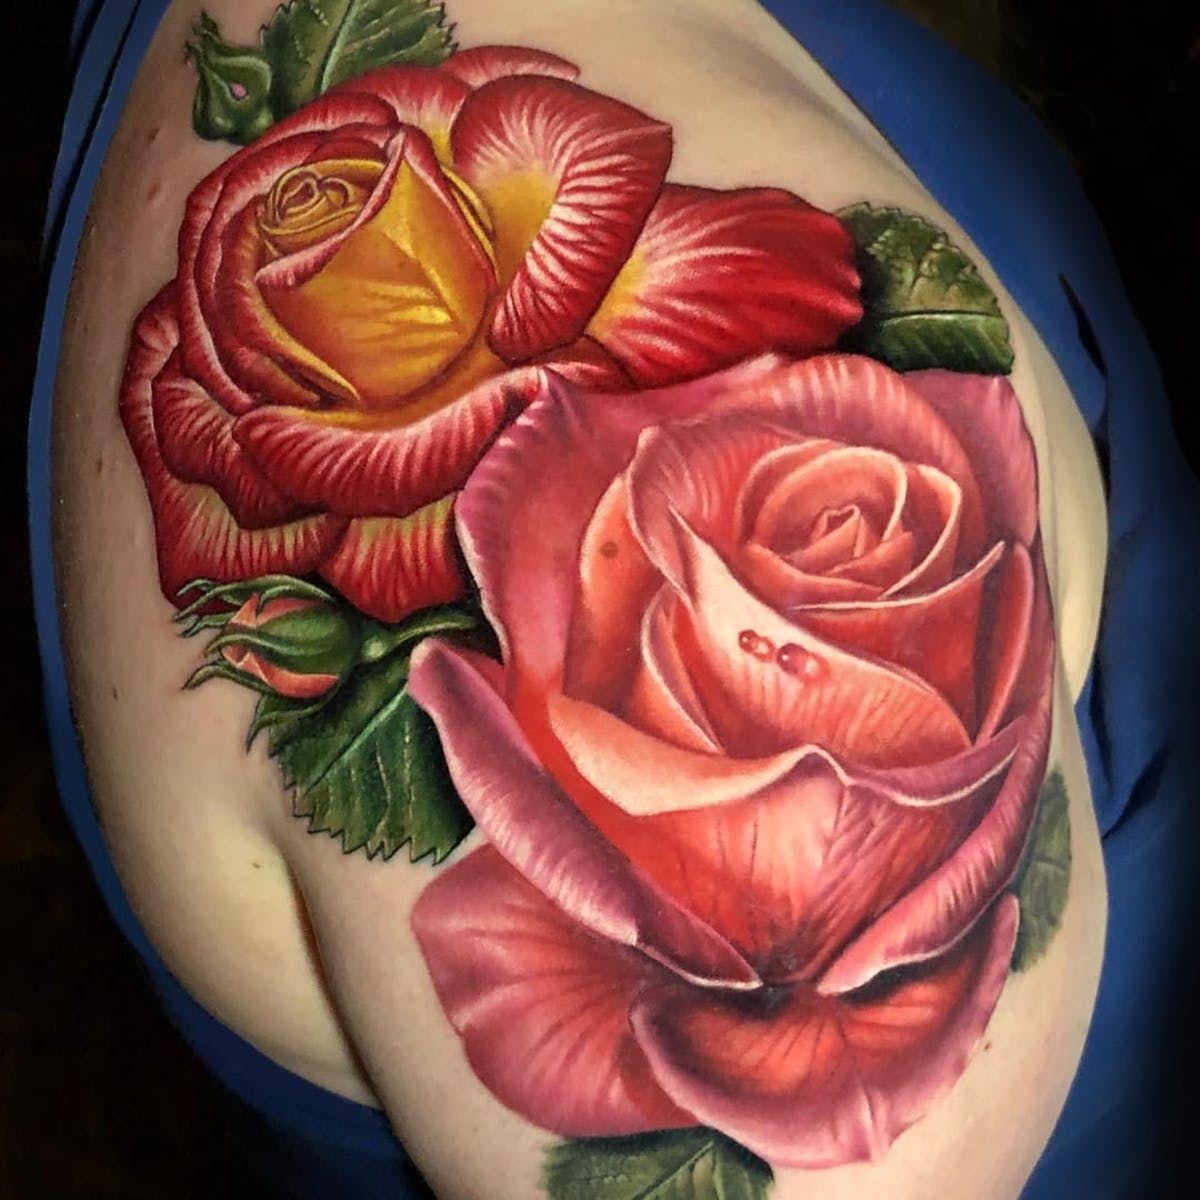 b8ecf8898 Realistic roses tattoo by Megan Massacre #MeganMassacre #besttattoos #color  #realism #realistic #hyperrealism #roses #rose #flower #rosebud #dewdrop  #leaves ...